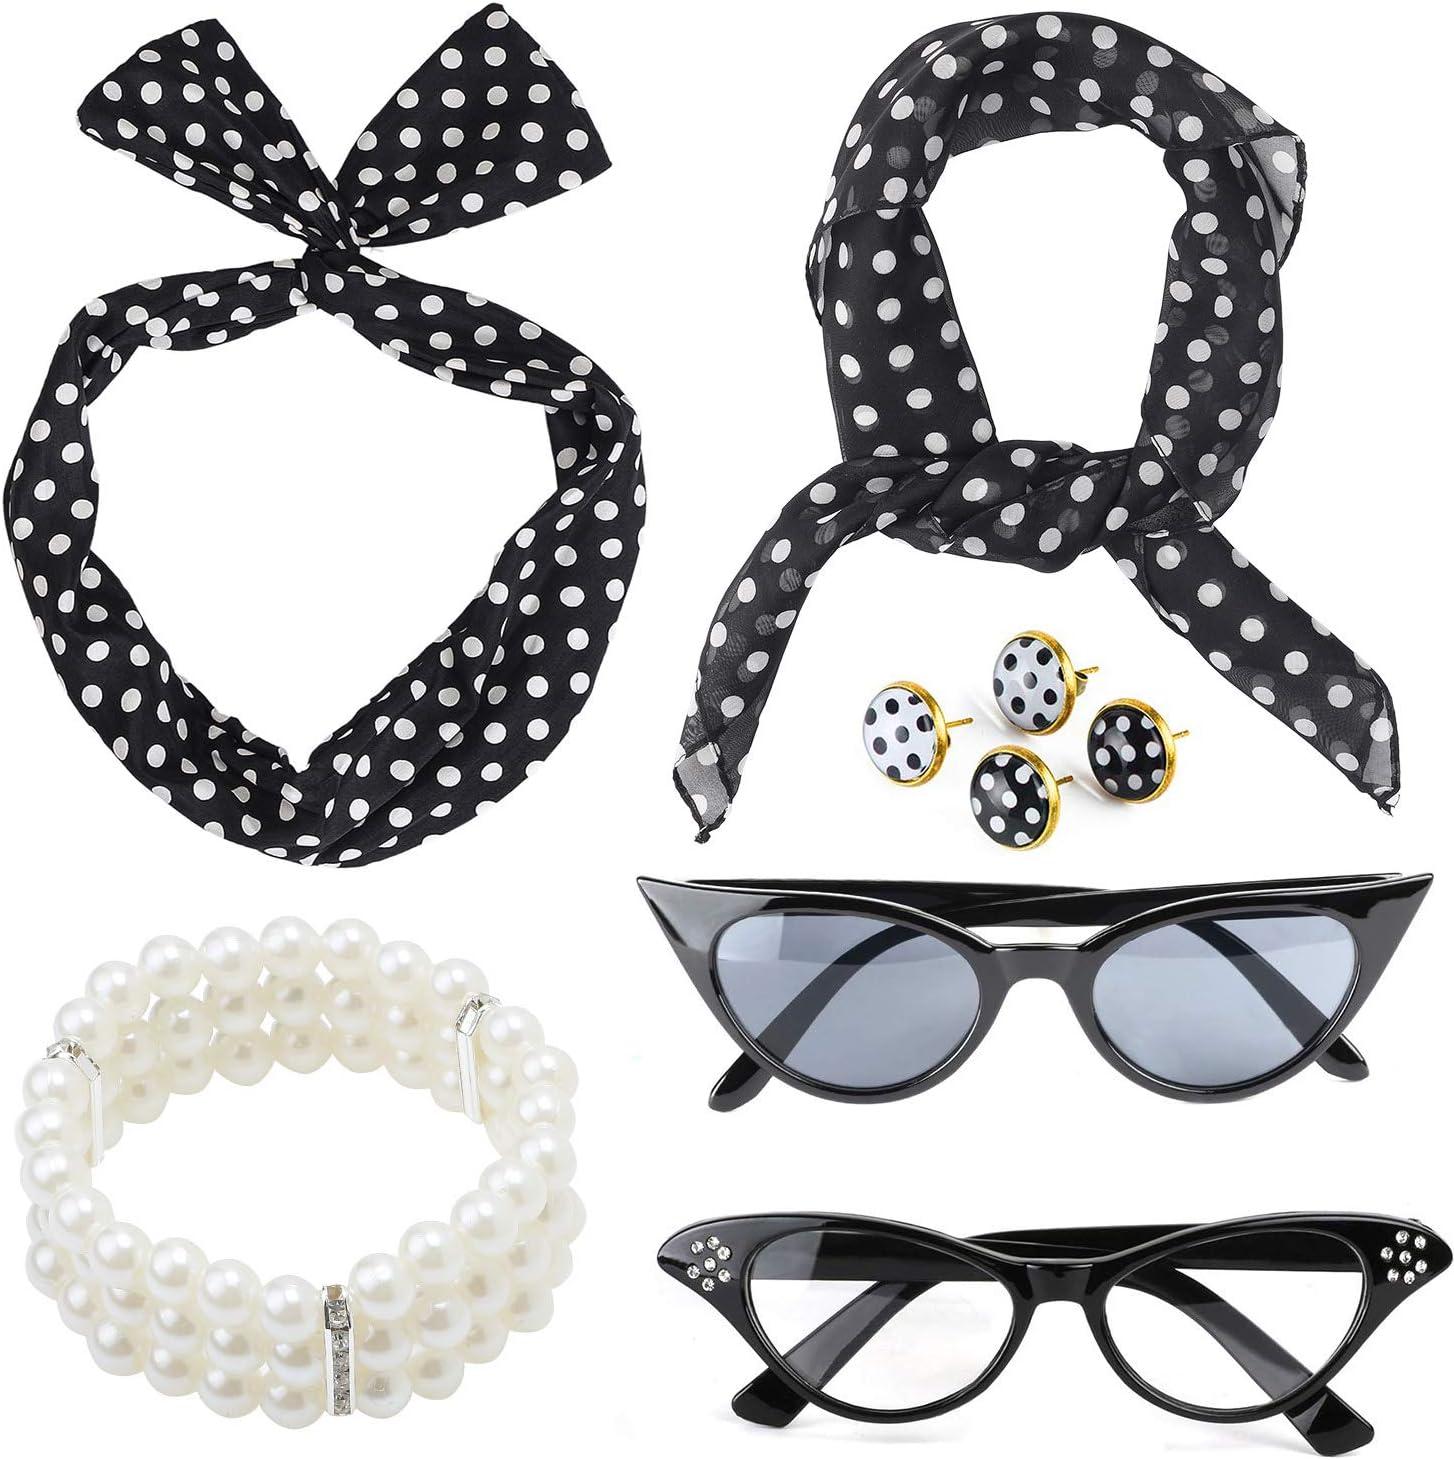 Beelittle 50's Women Costume Accessories Set Polka Dot Chiffon Scarf Bandana Tie Diadema Pendientes Retro Cat Eye Eglasses Pulsera de Perlas (Negro)